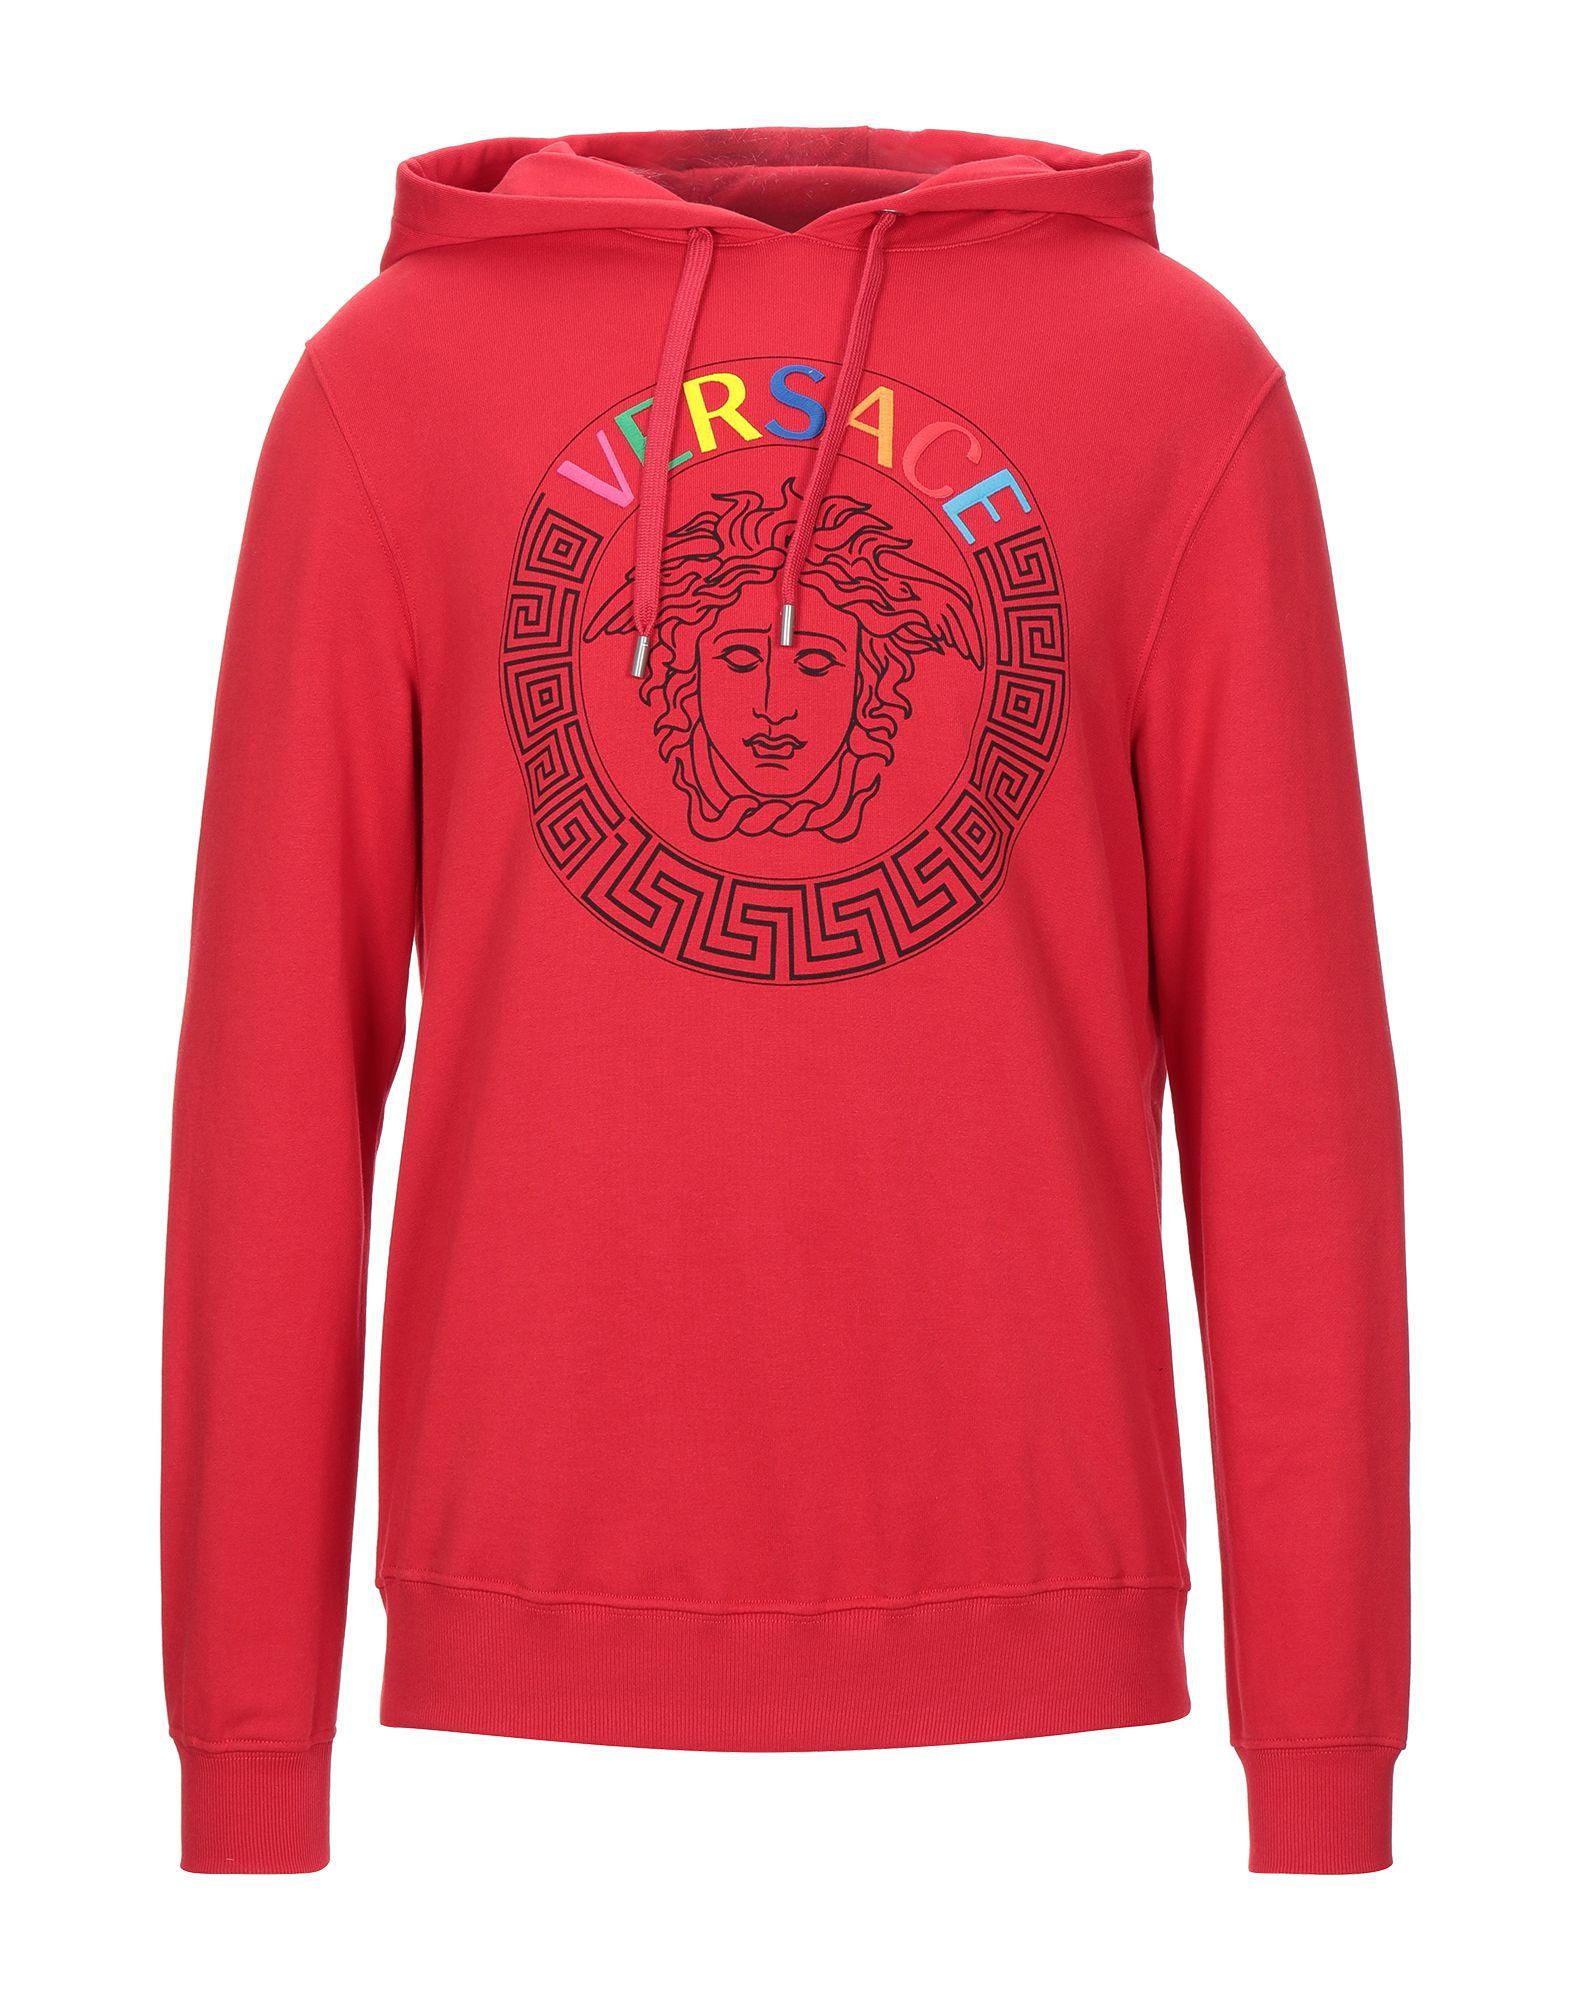 sweatshirt fleece, contrasting applications, logo, solid color, hooded collar, long sleeves, no pock